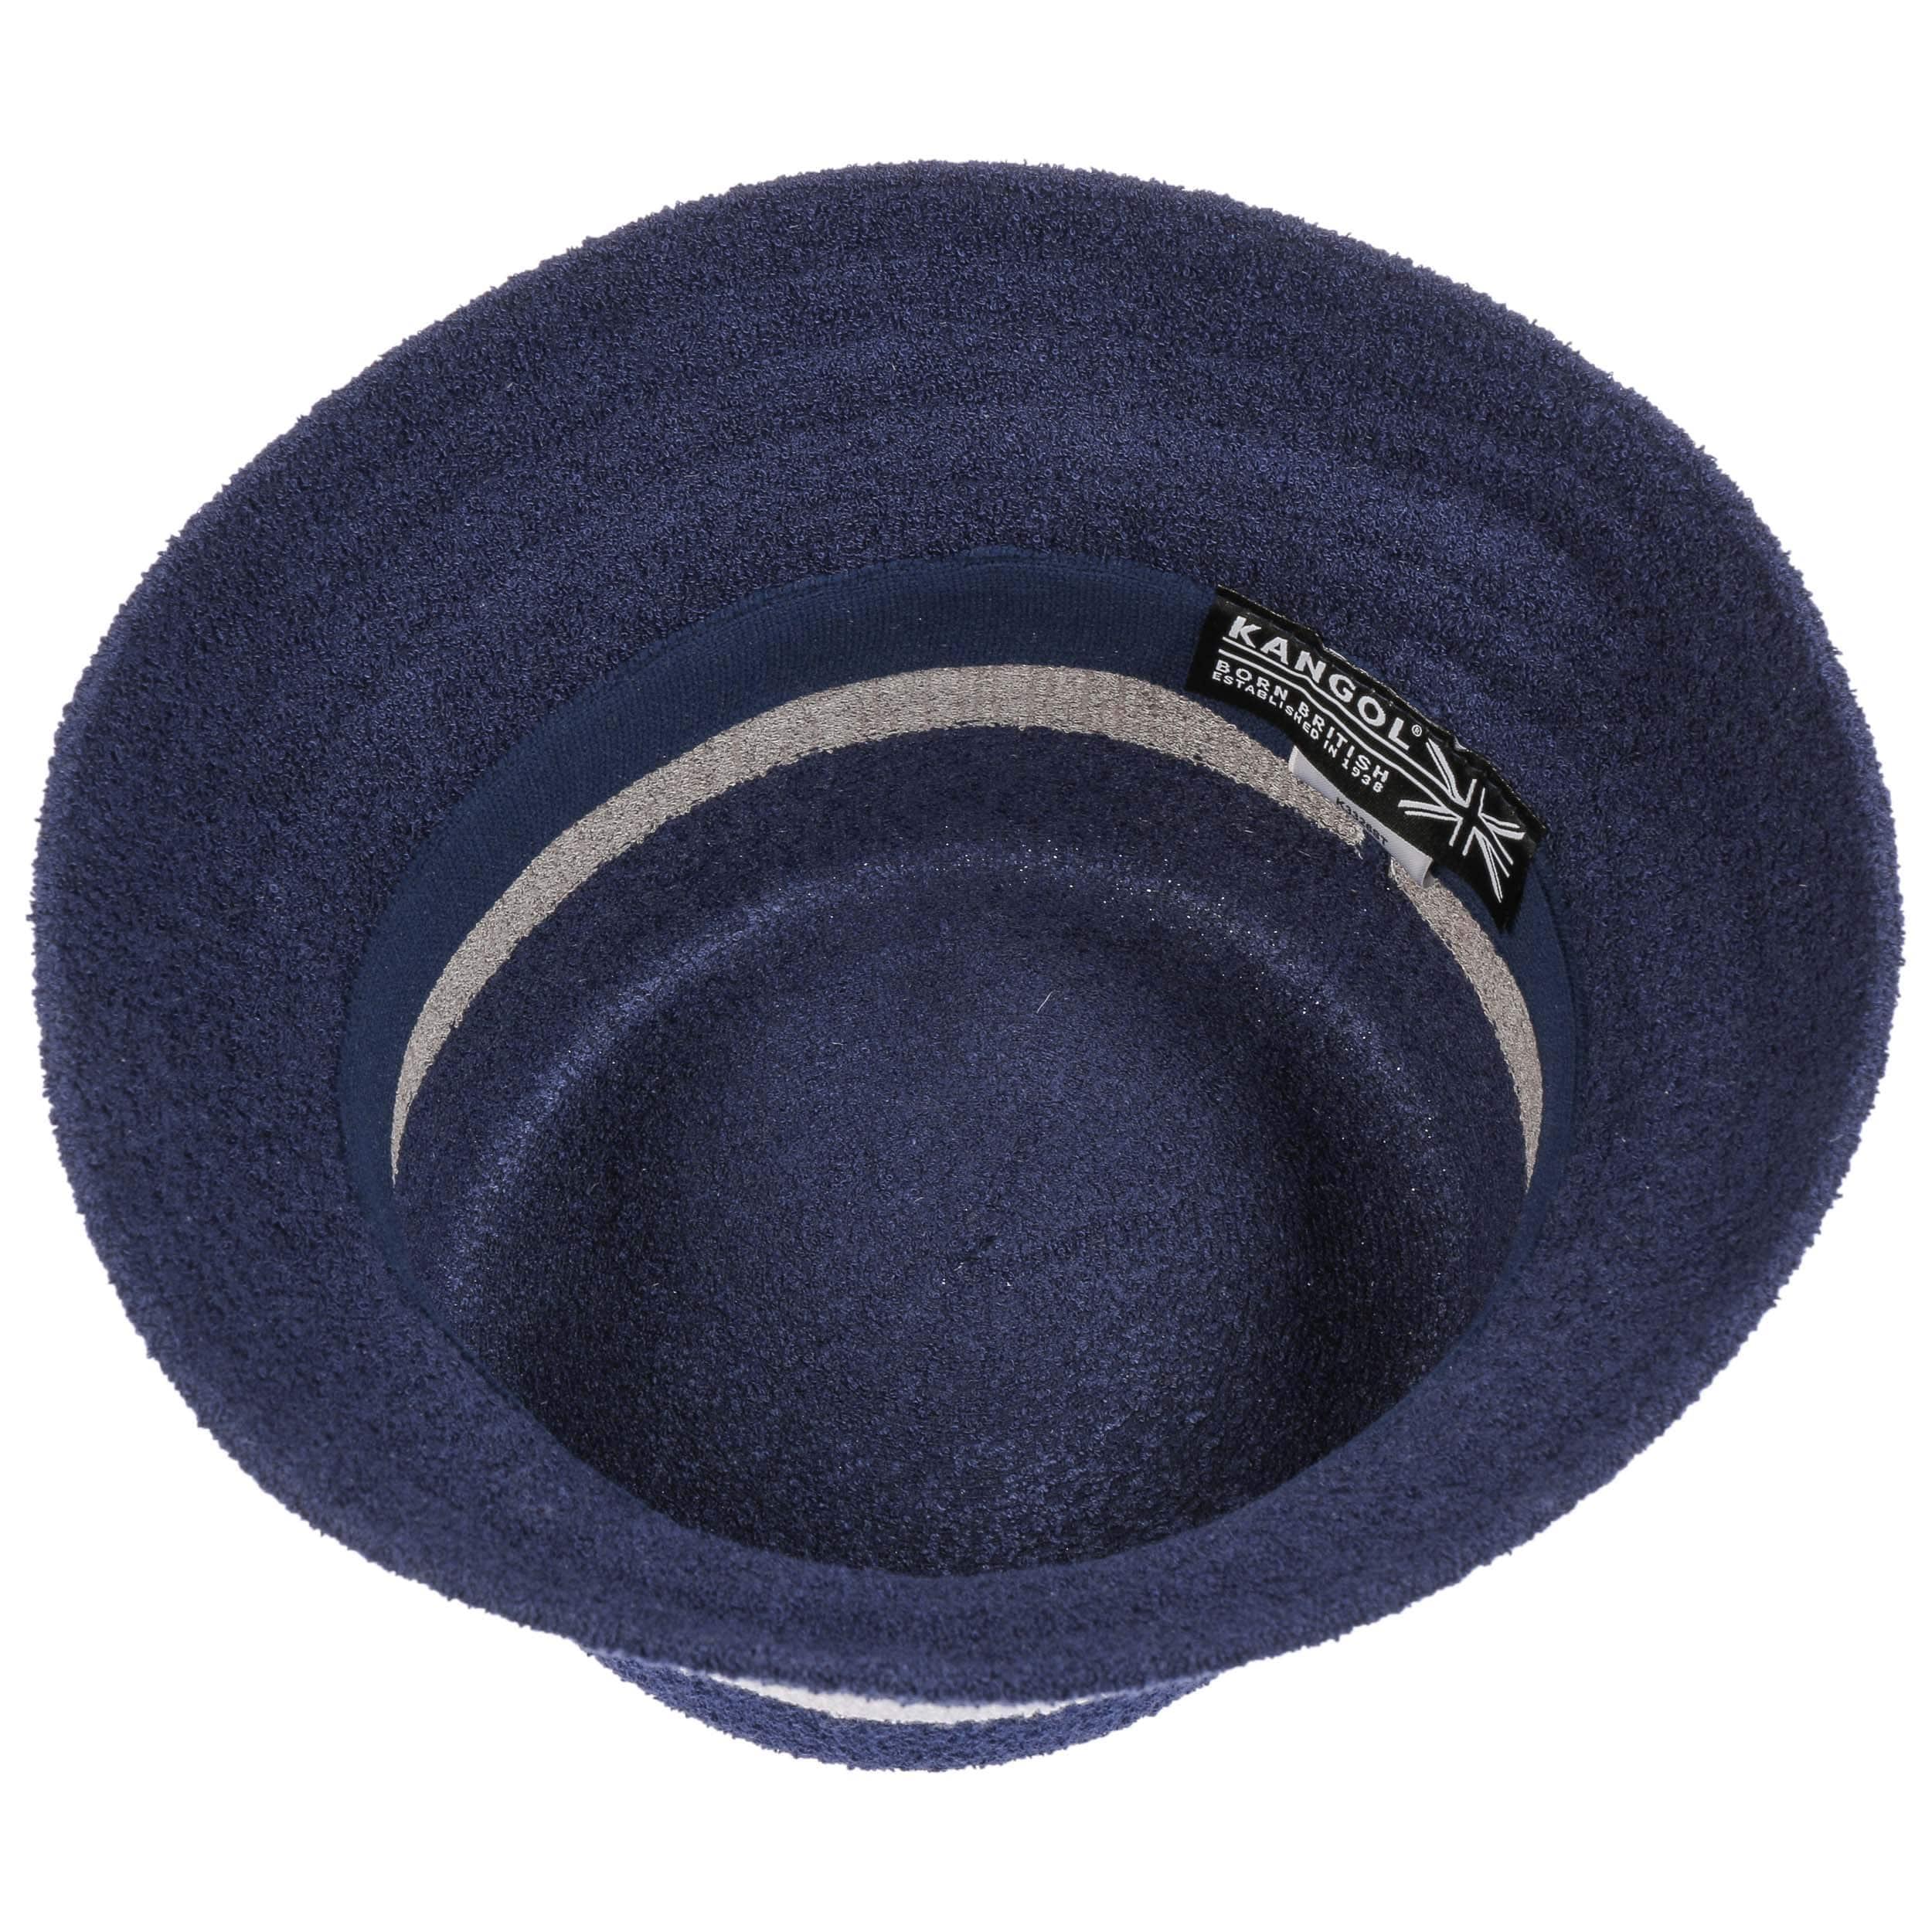 3a69286a6 Bermuda Stripe Bucket Hat by Kangol